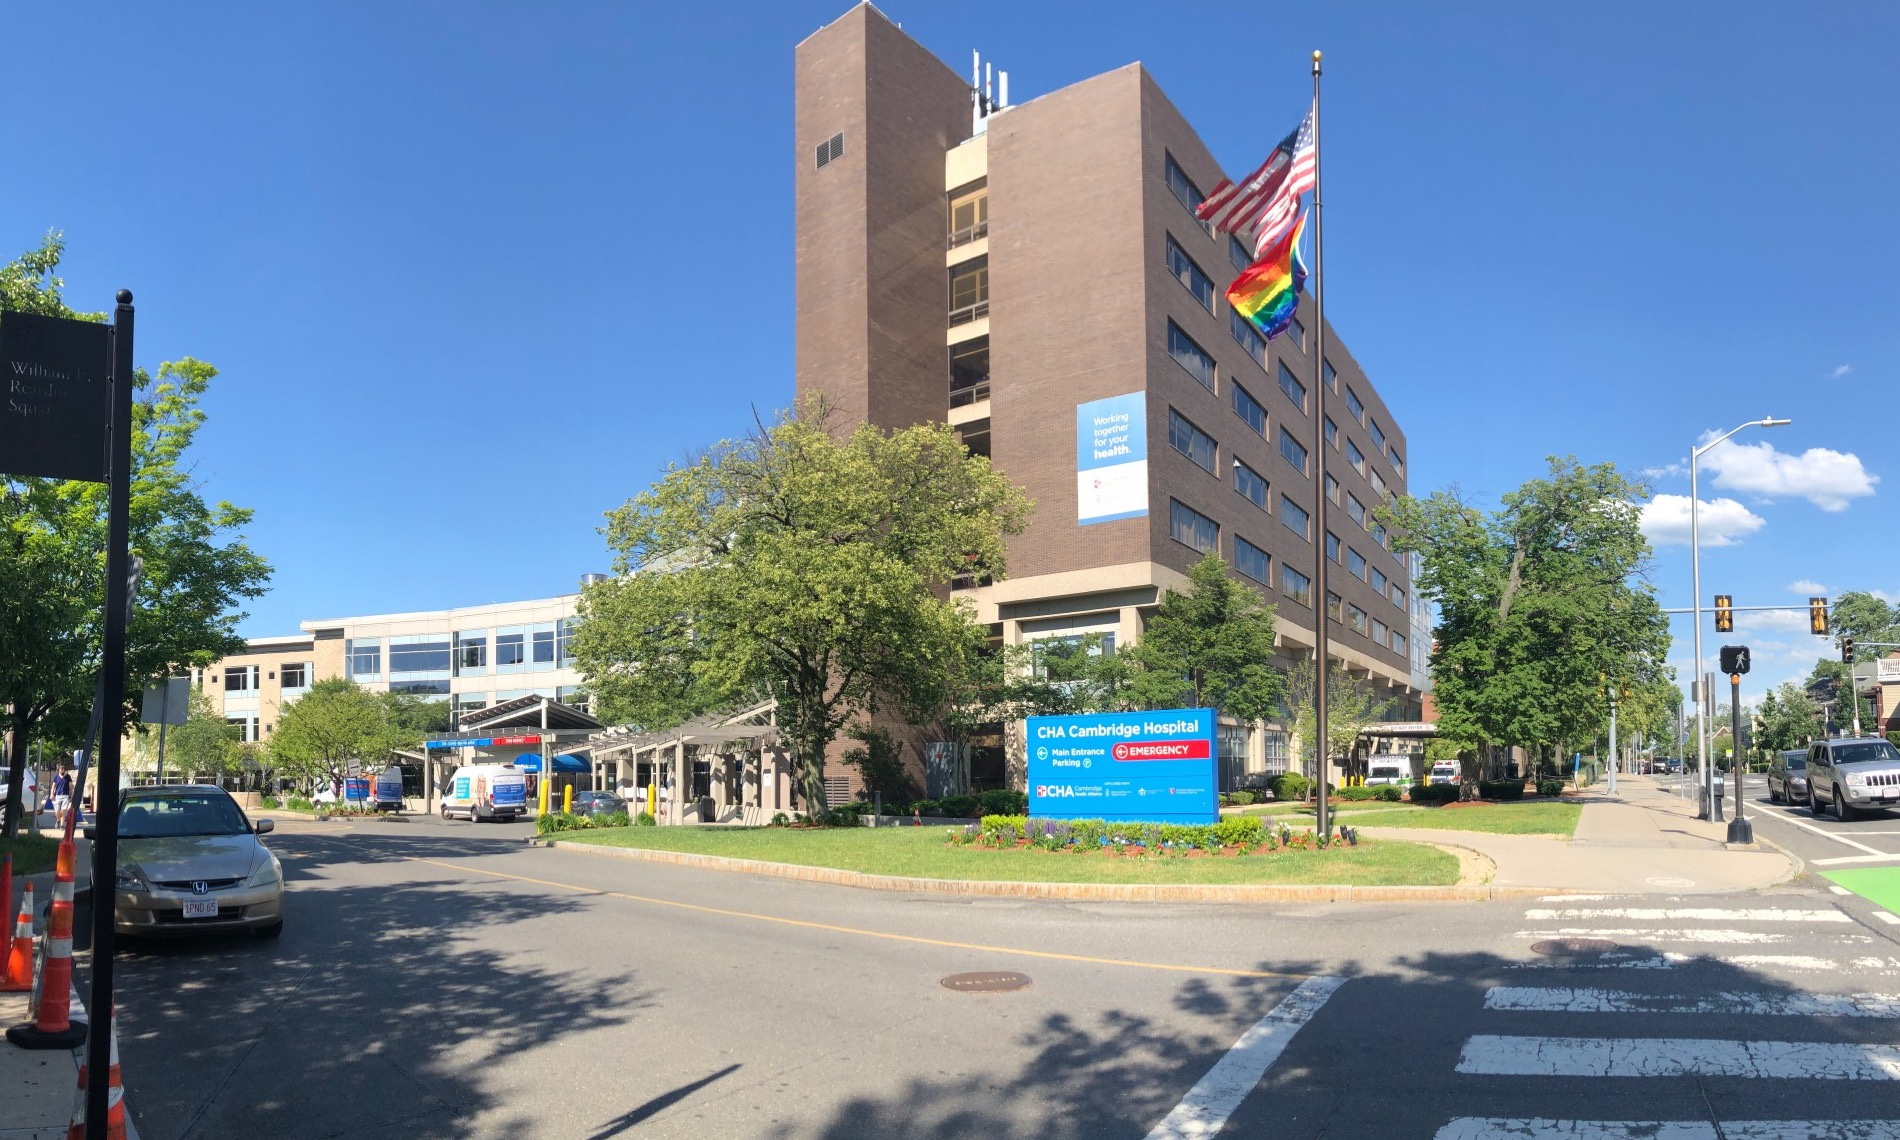 CHA Cambridge Hospital